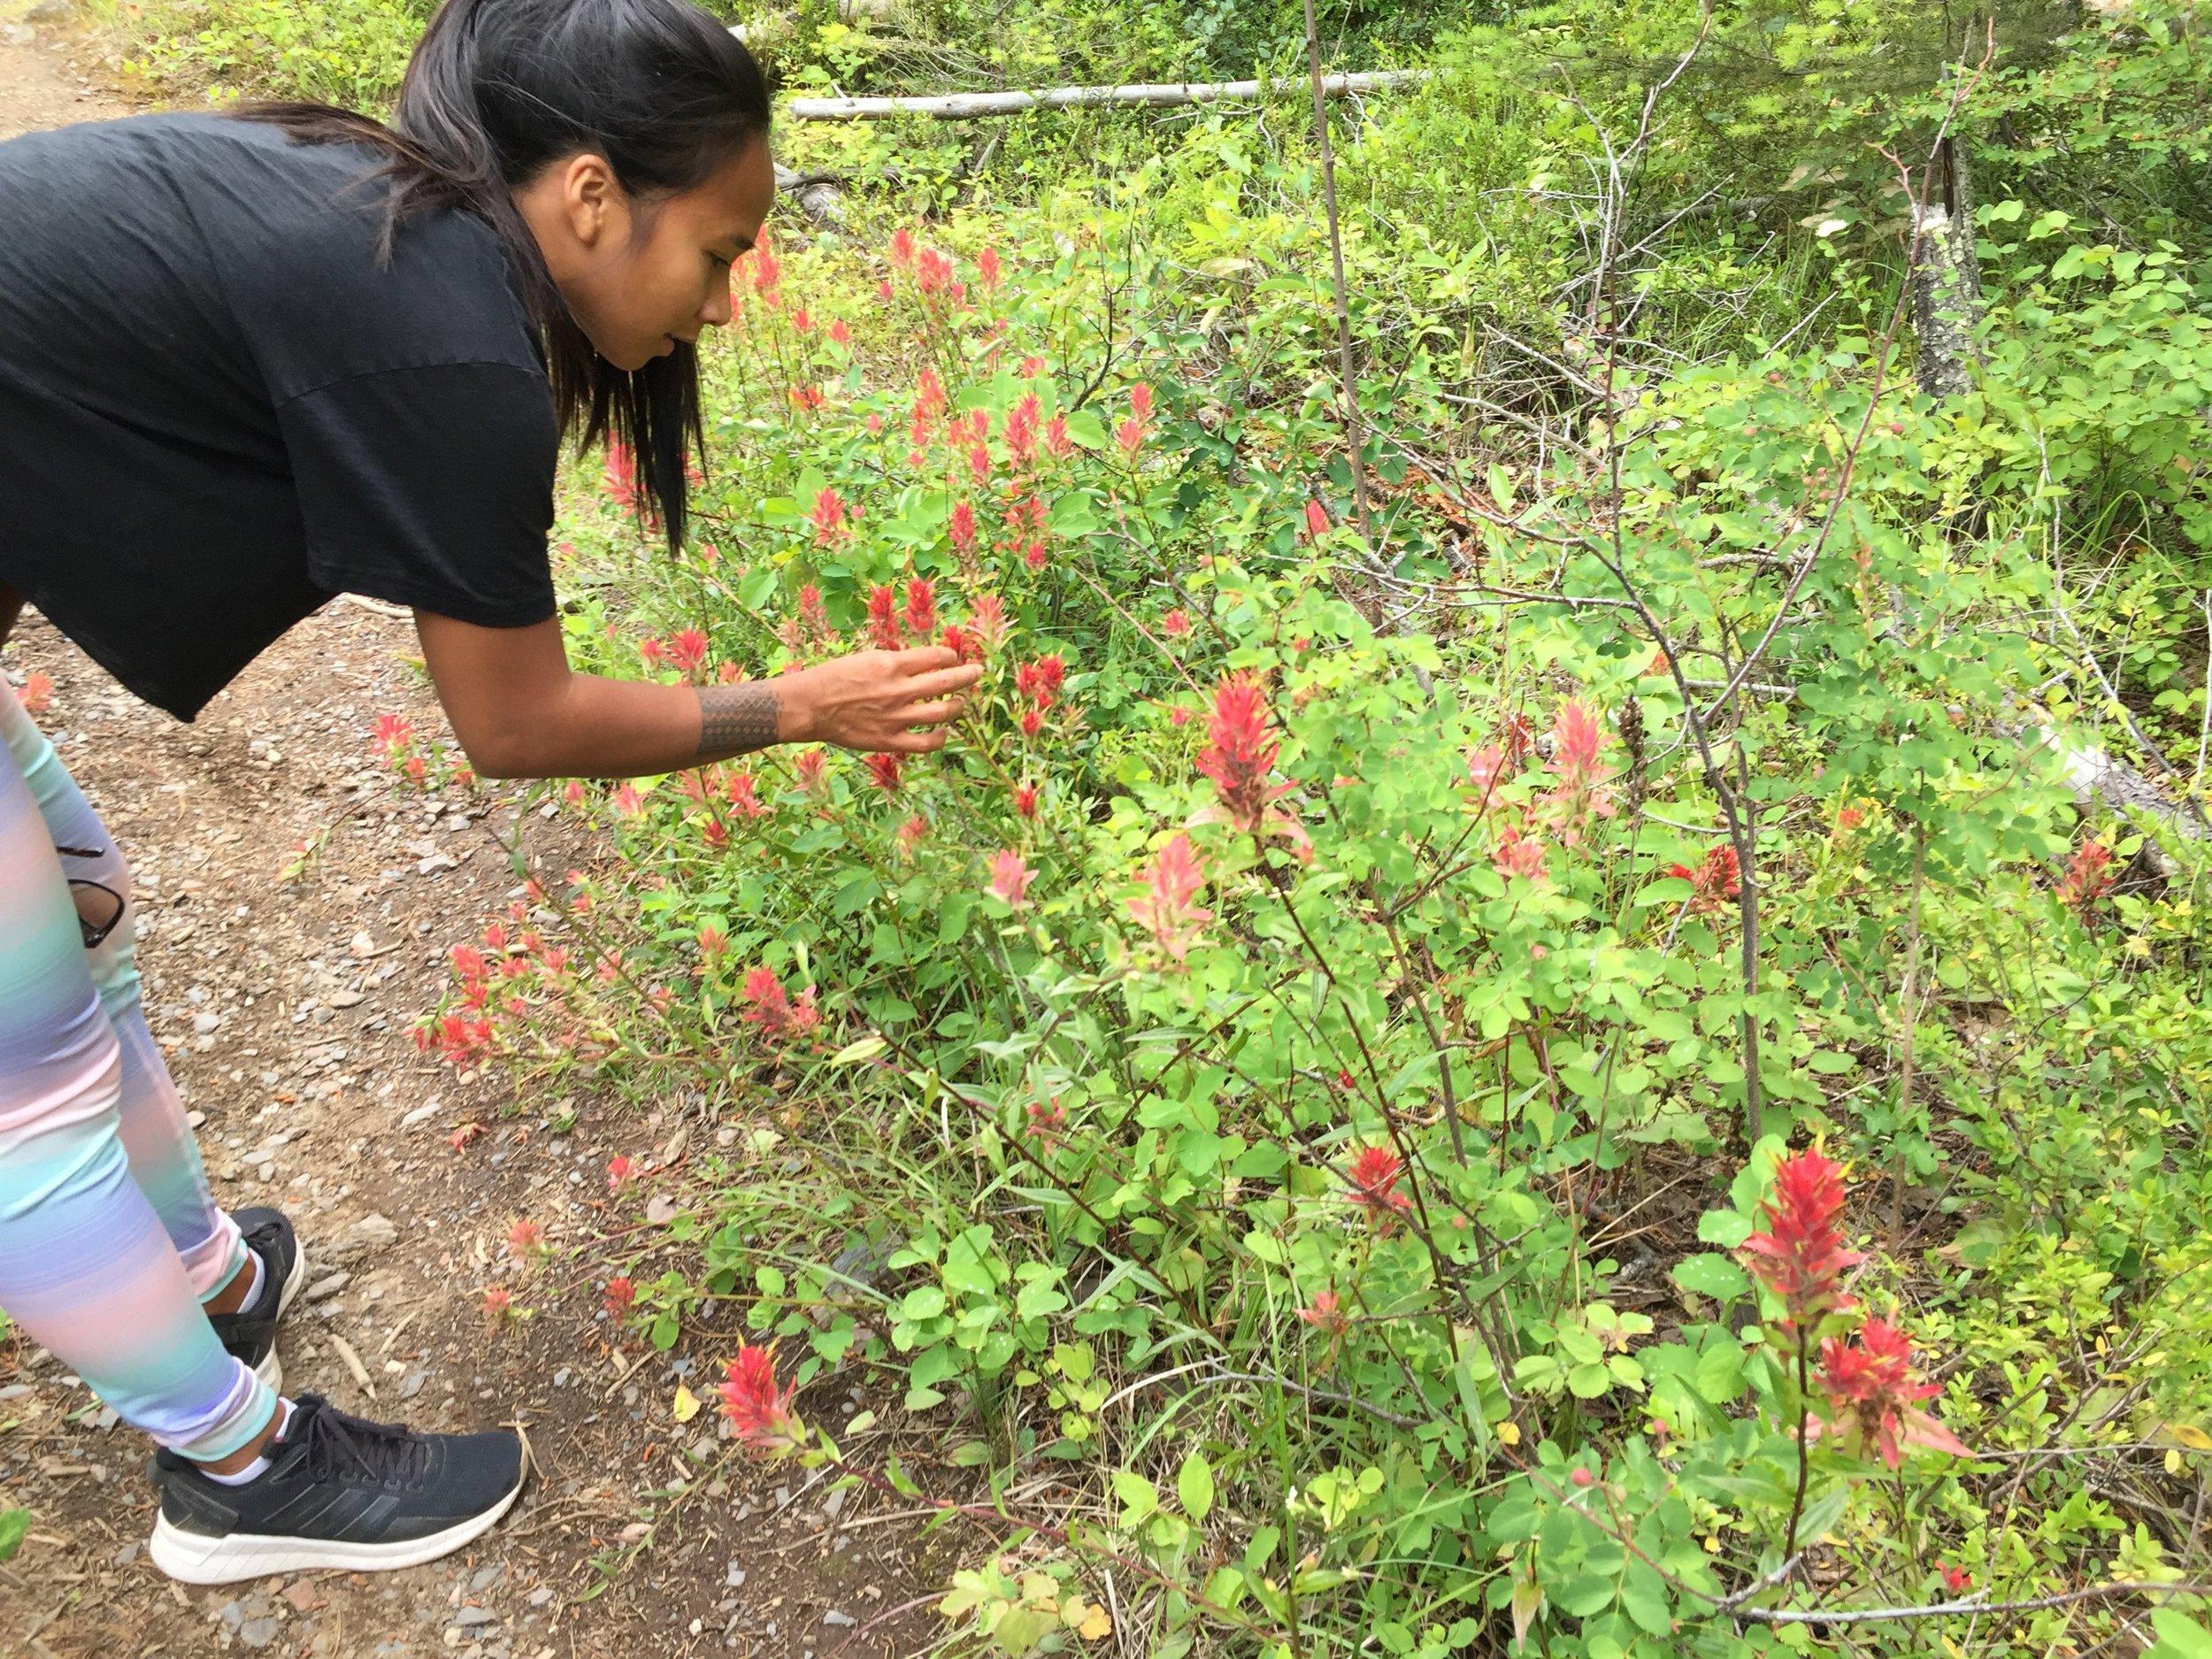 mount-rose-swanson-okanagan-valley-british-columbia-canada.jpg